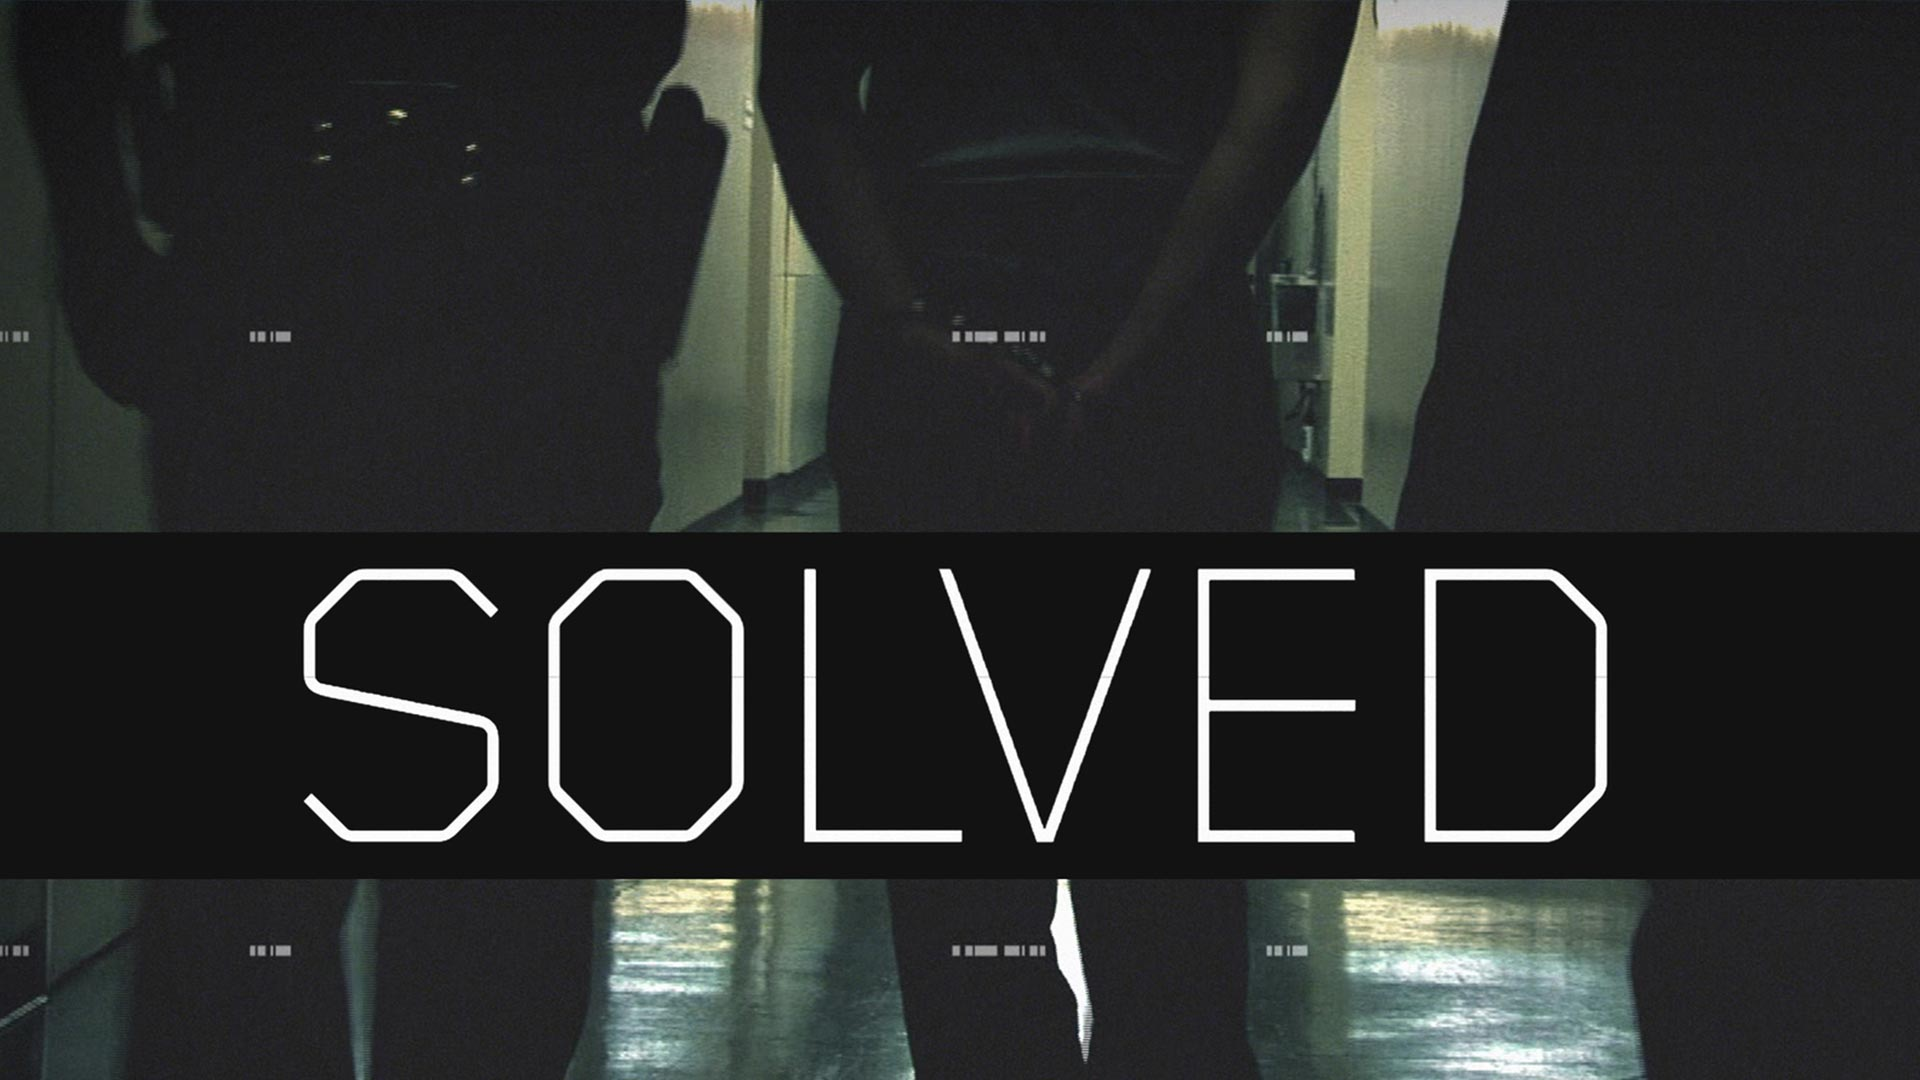 Solved - Season 1